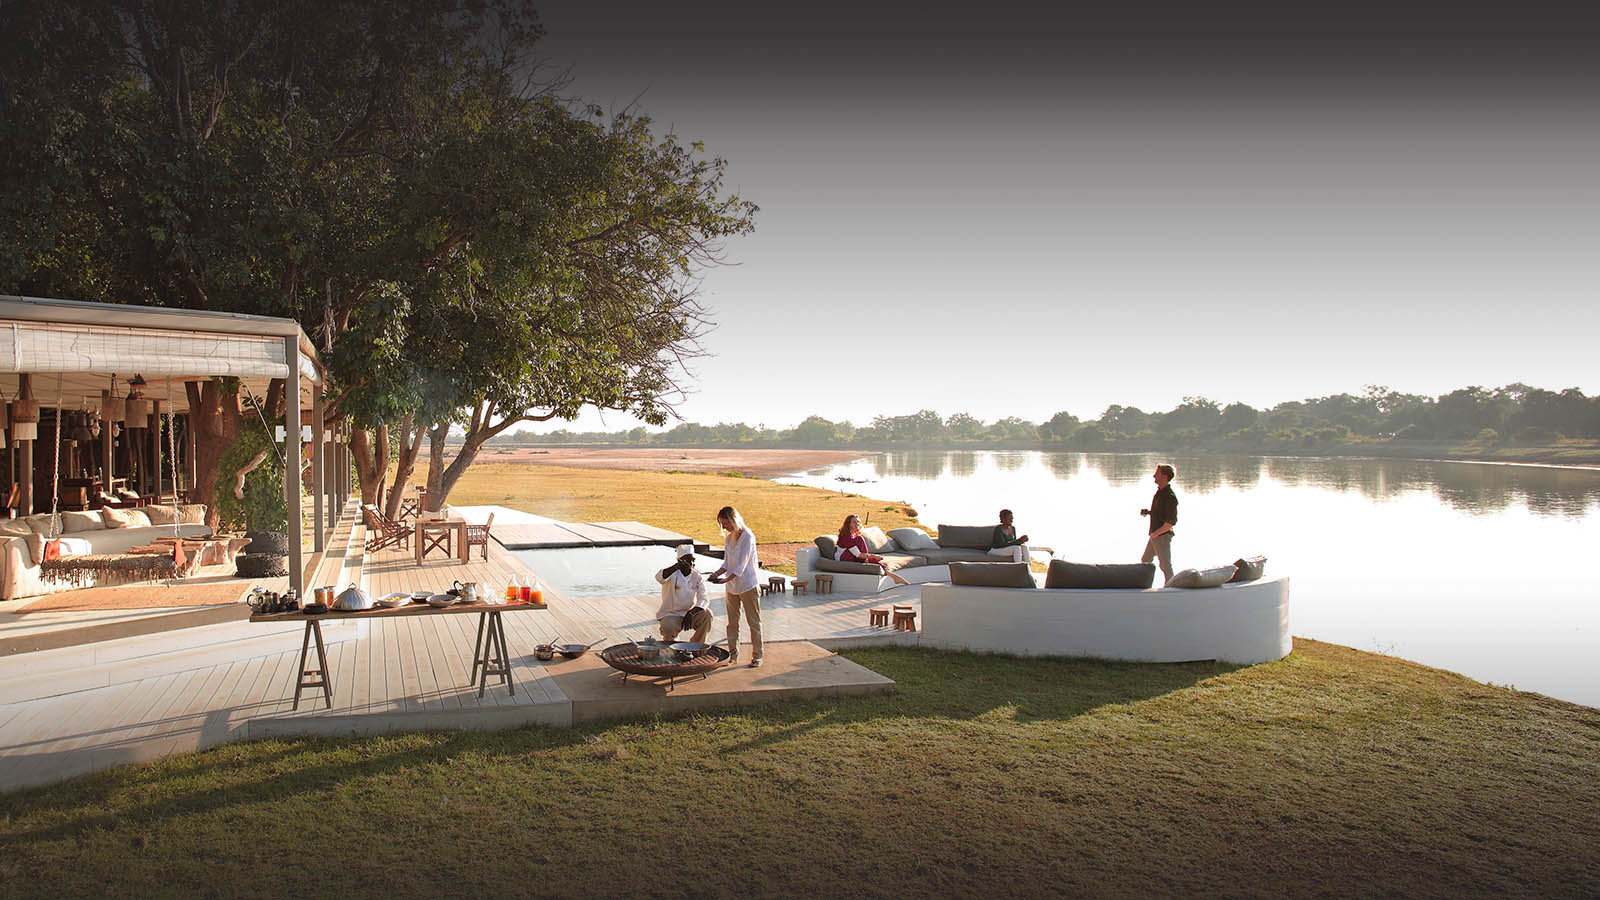 classic-zambia-short-zambia-in-style-safari-packages-tours-chinzombo